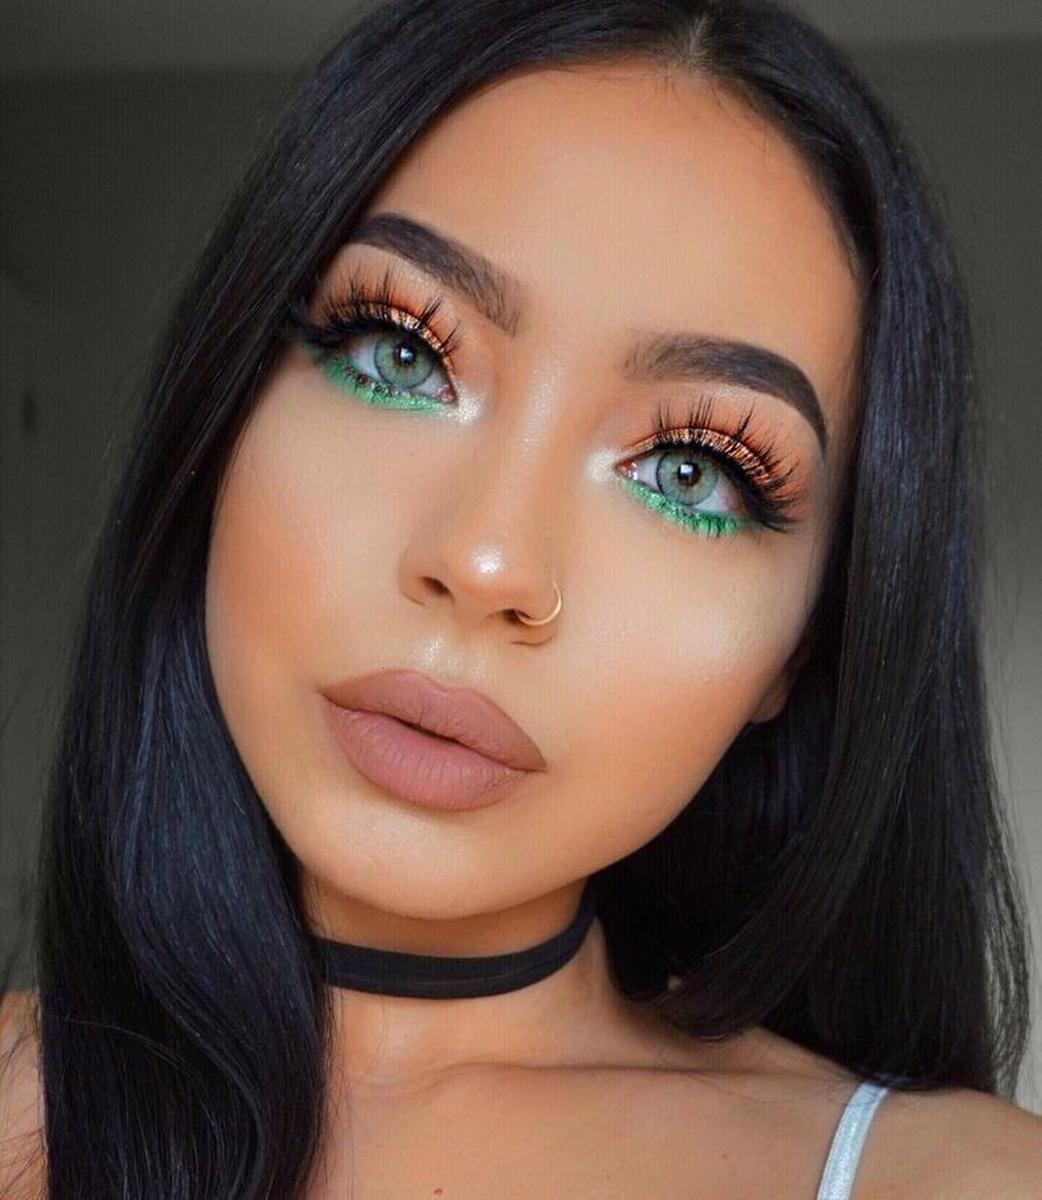 Cool Makeup Goals #makeupgoals